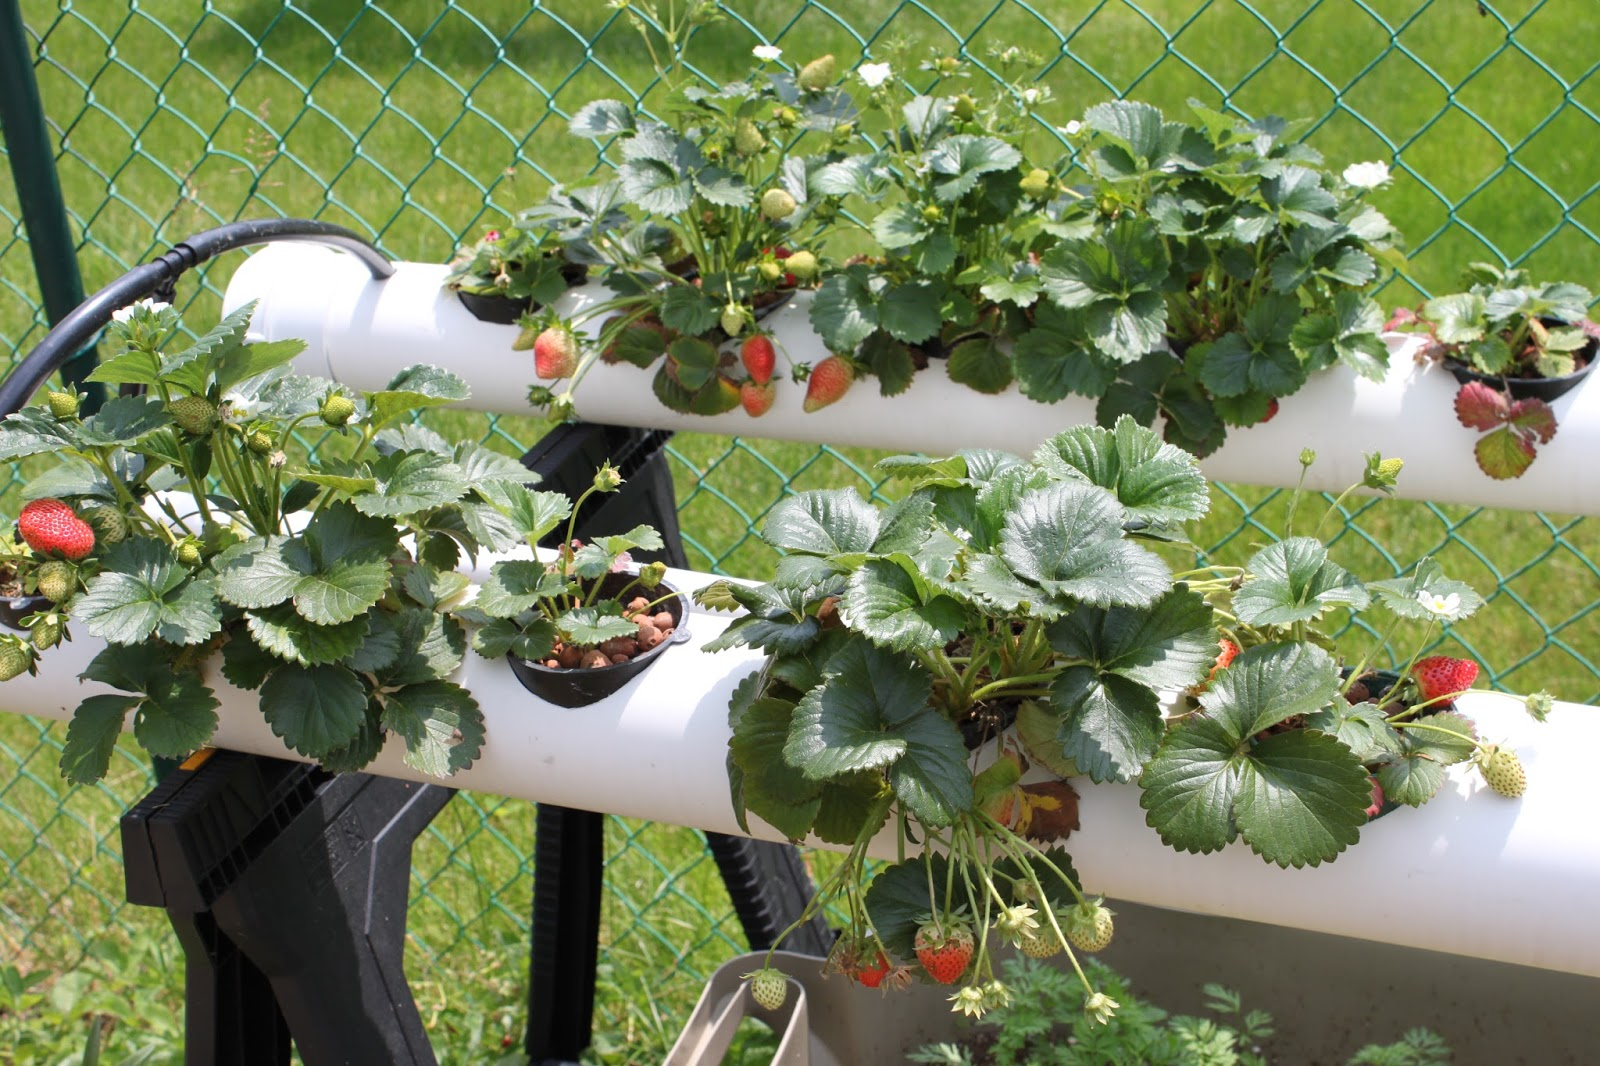 Simpson Eco Farms Strawberry Hydroponics Update